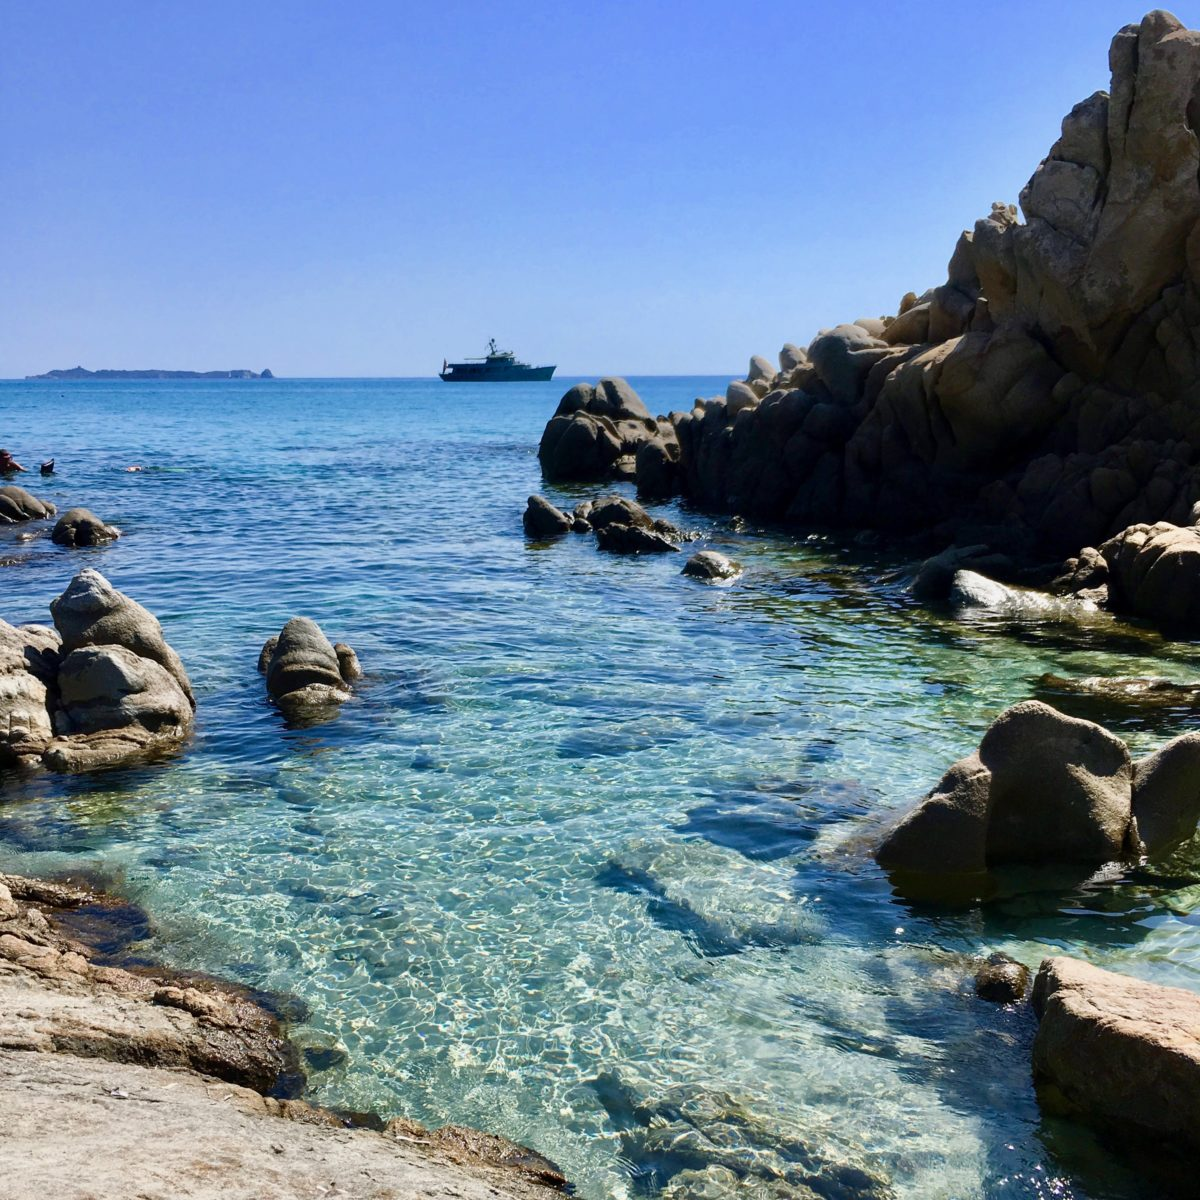 Am Strand von Villasimius